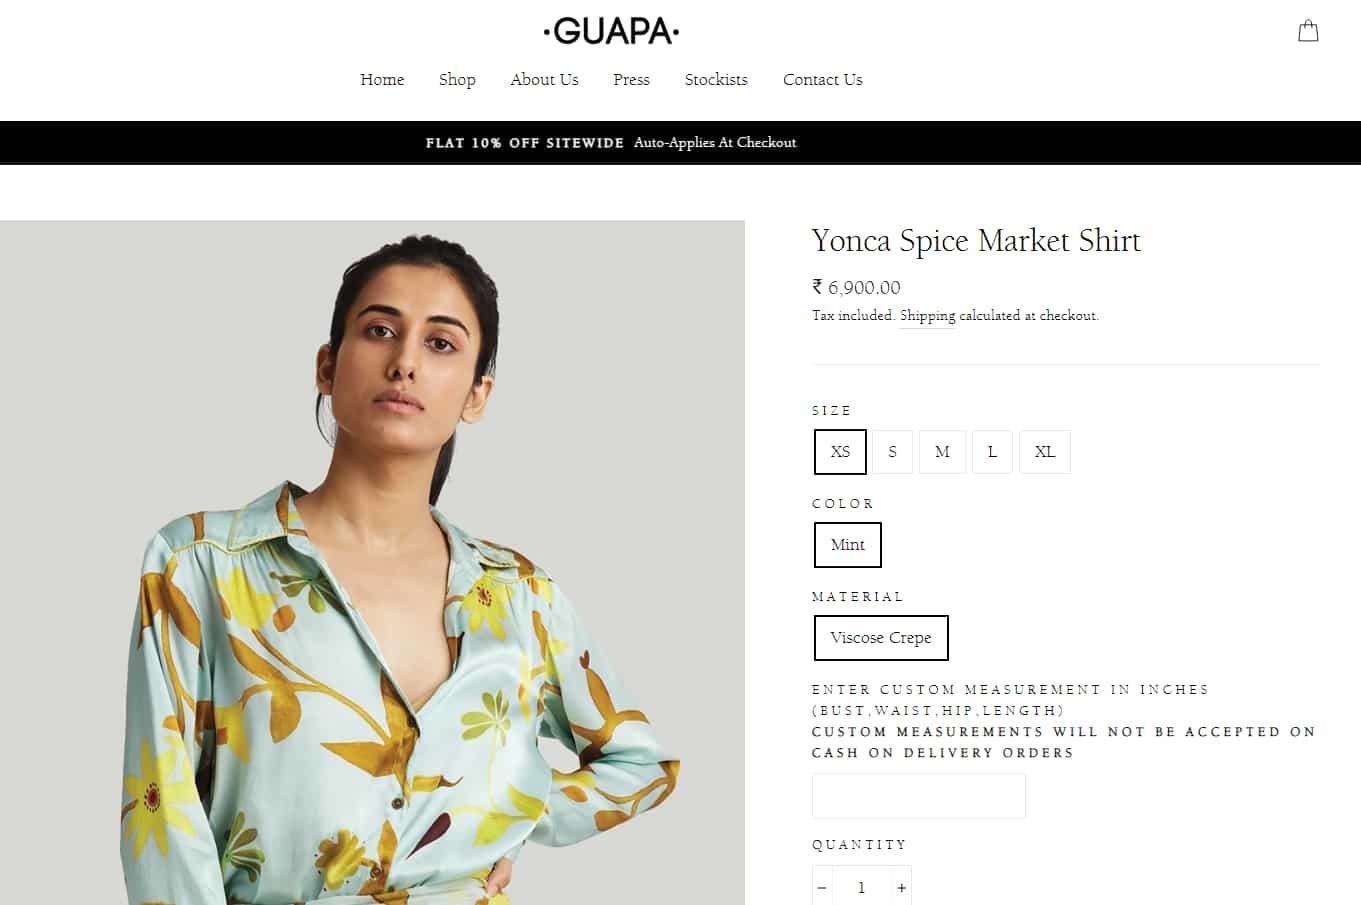 Aditi Rao Hydari In 8k Floral Print Shirt Mini Shorts Is Summer Outfit Goals Hindustan Times